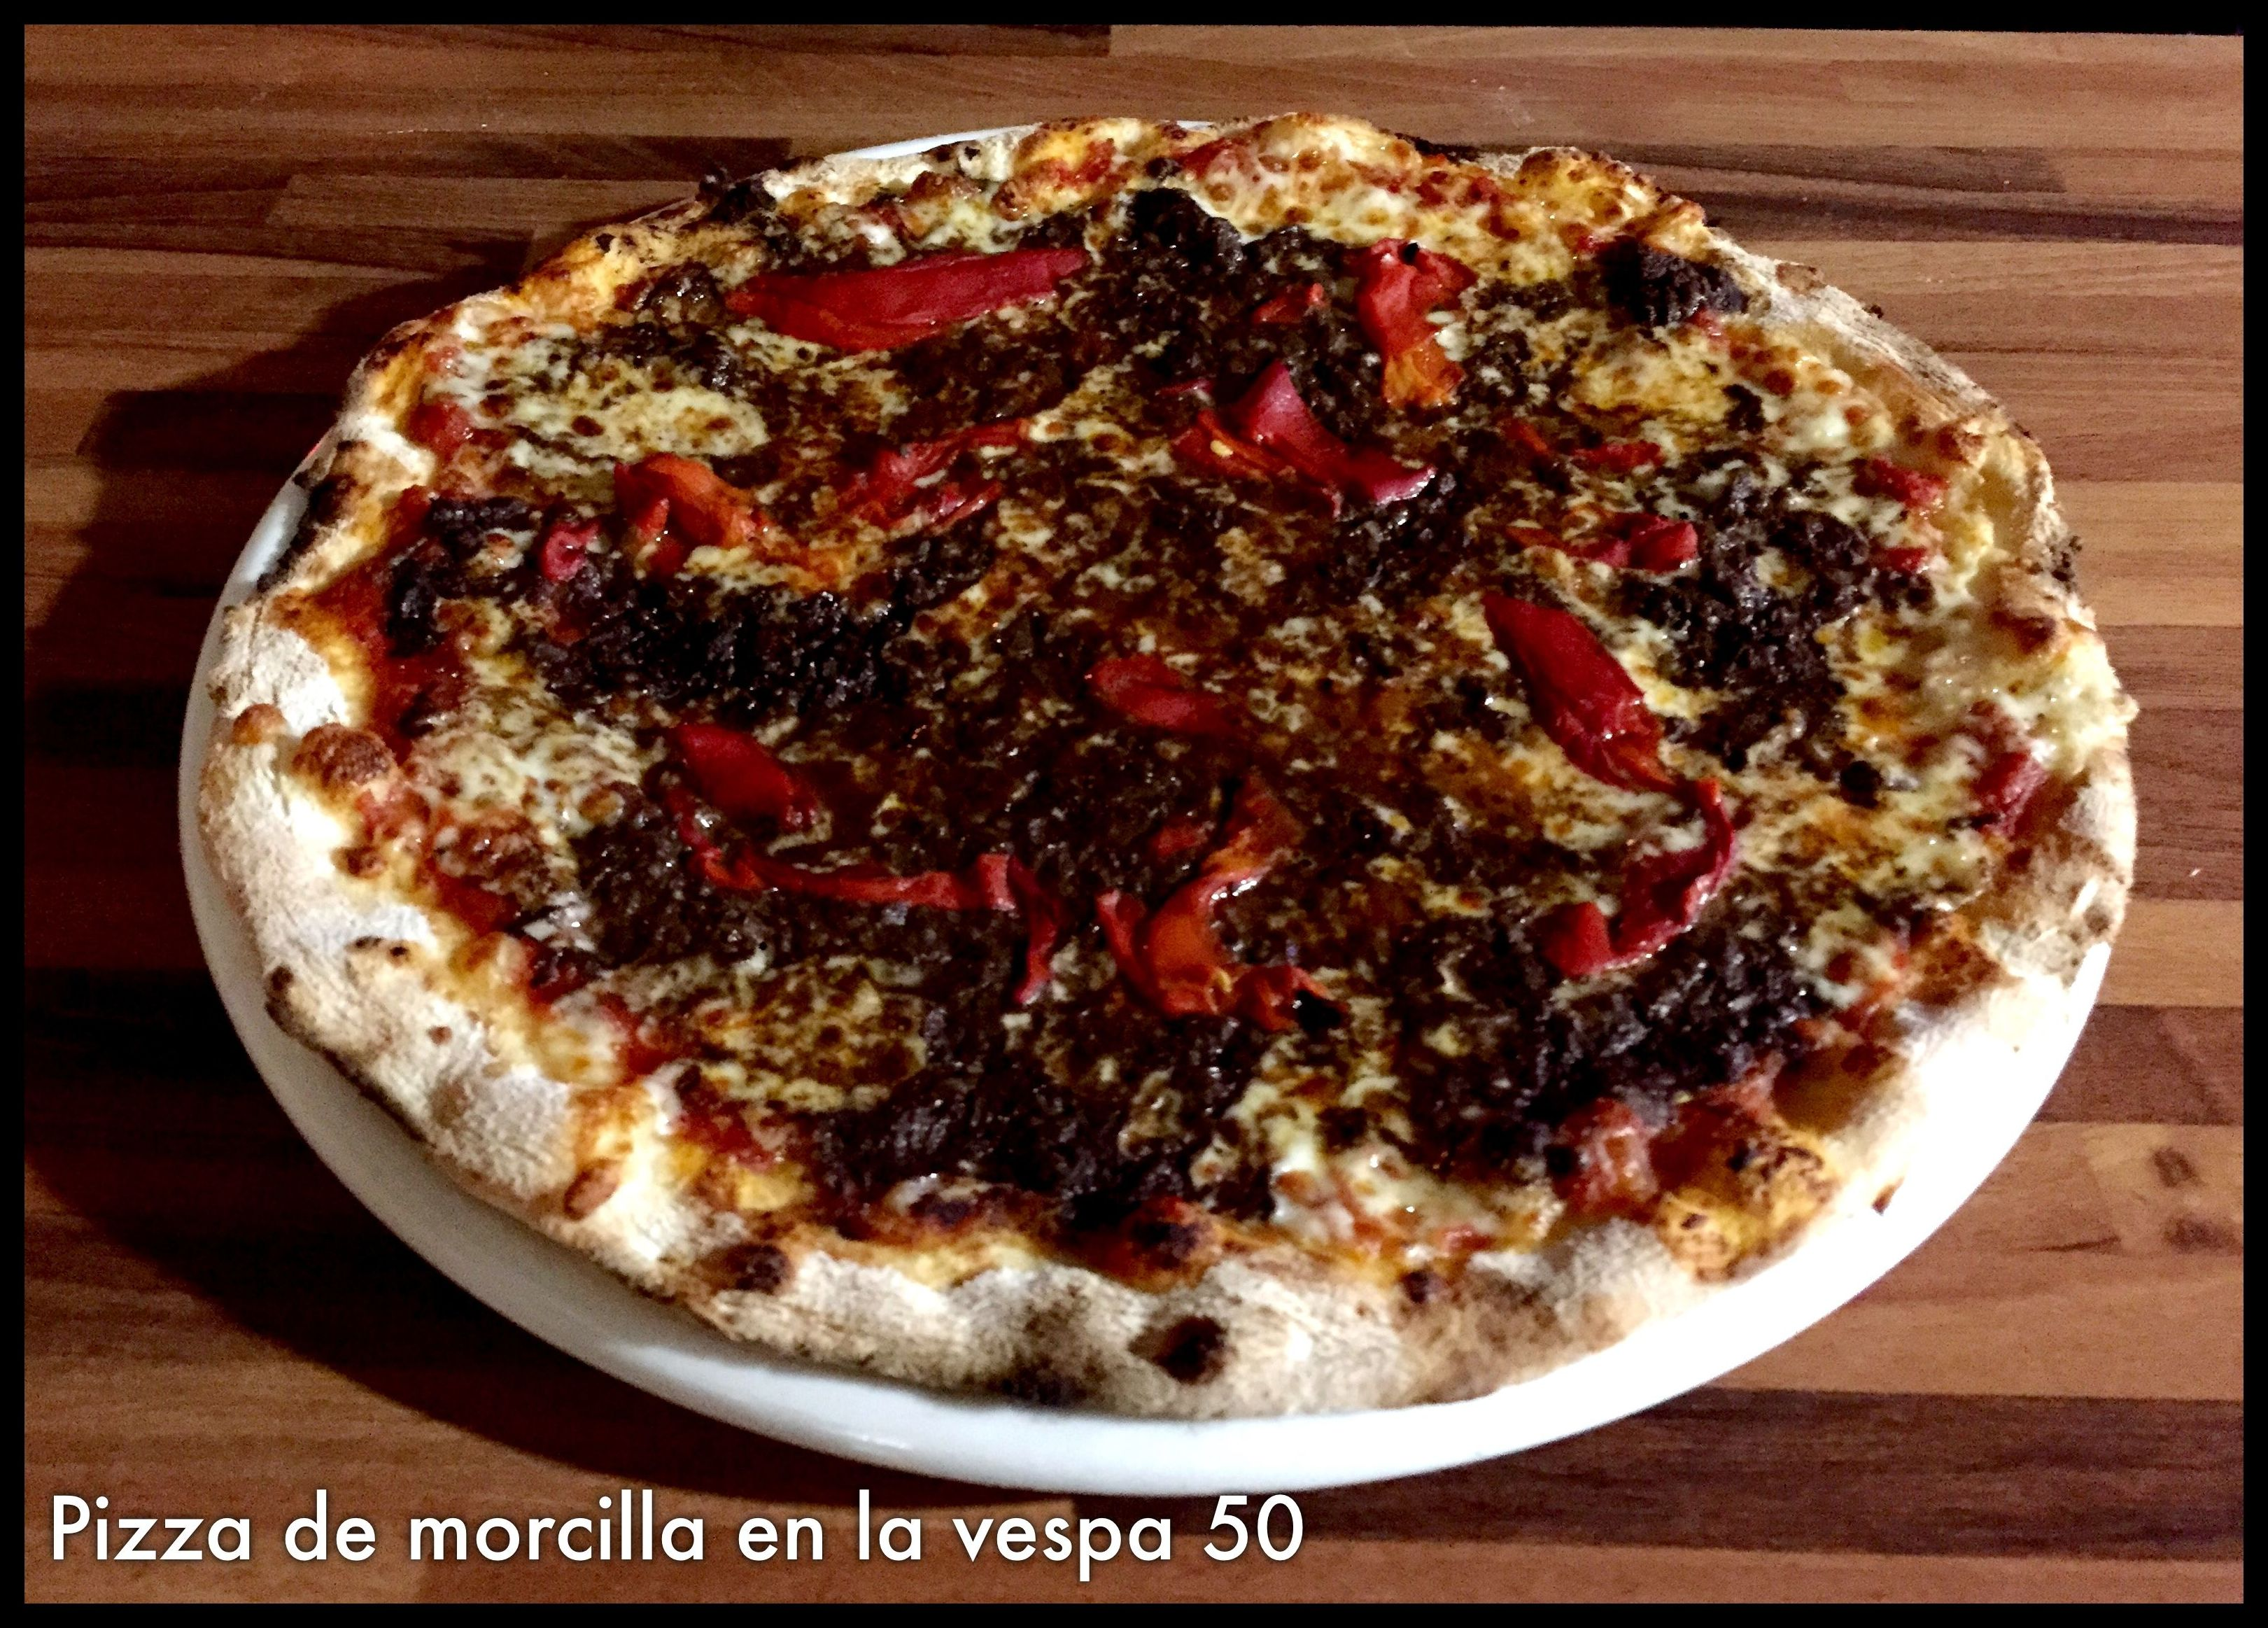 Pizza de morcilla Leonesa.